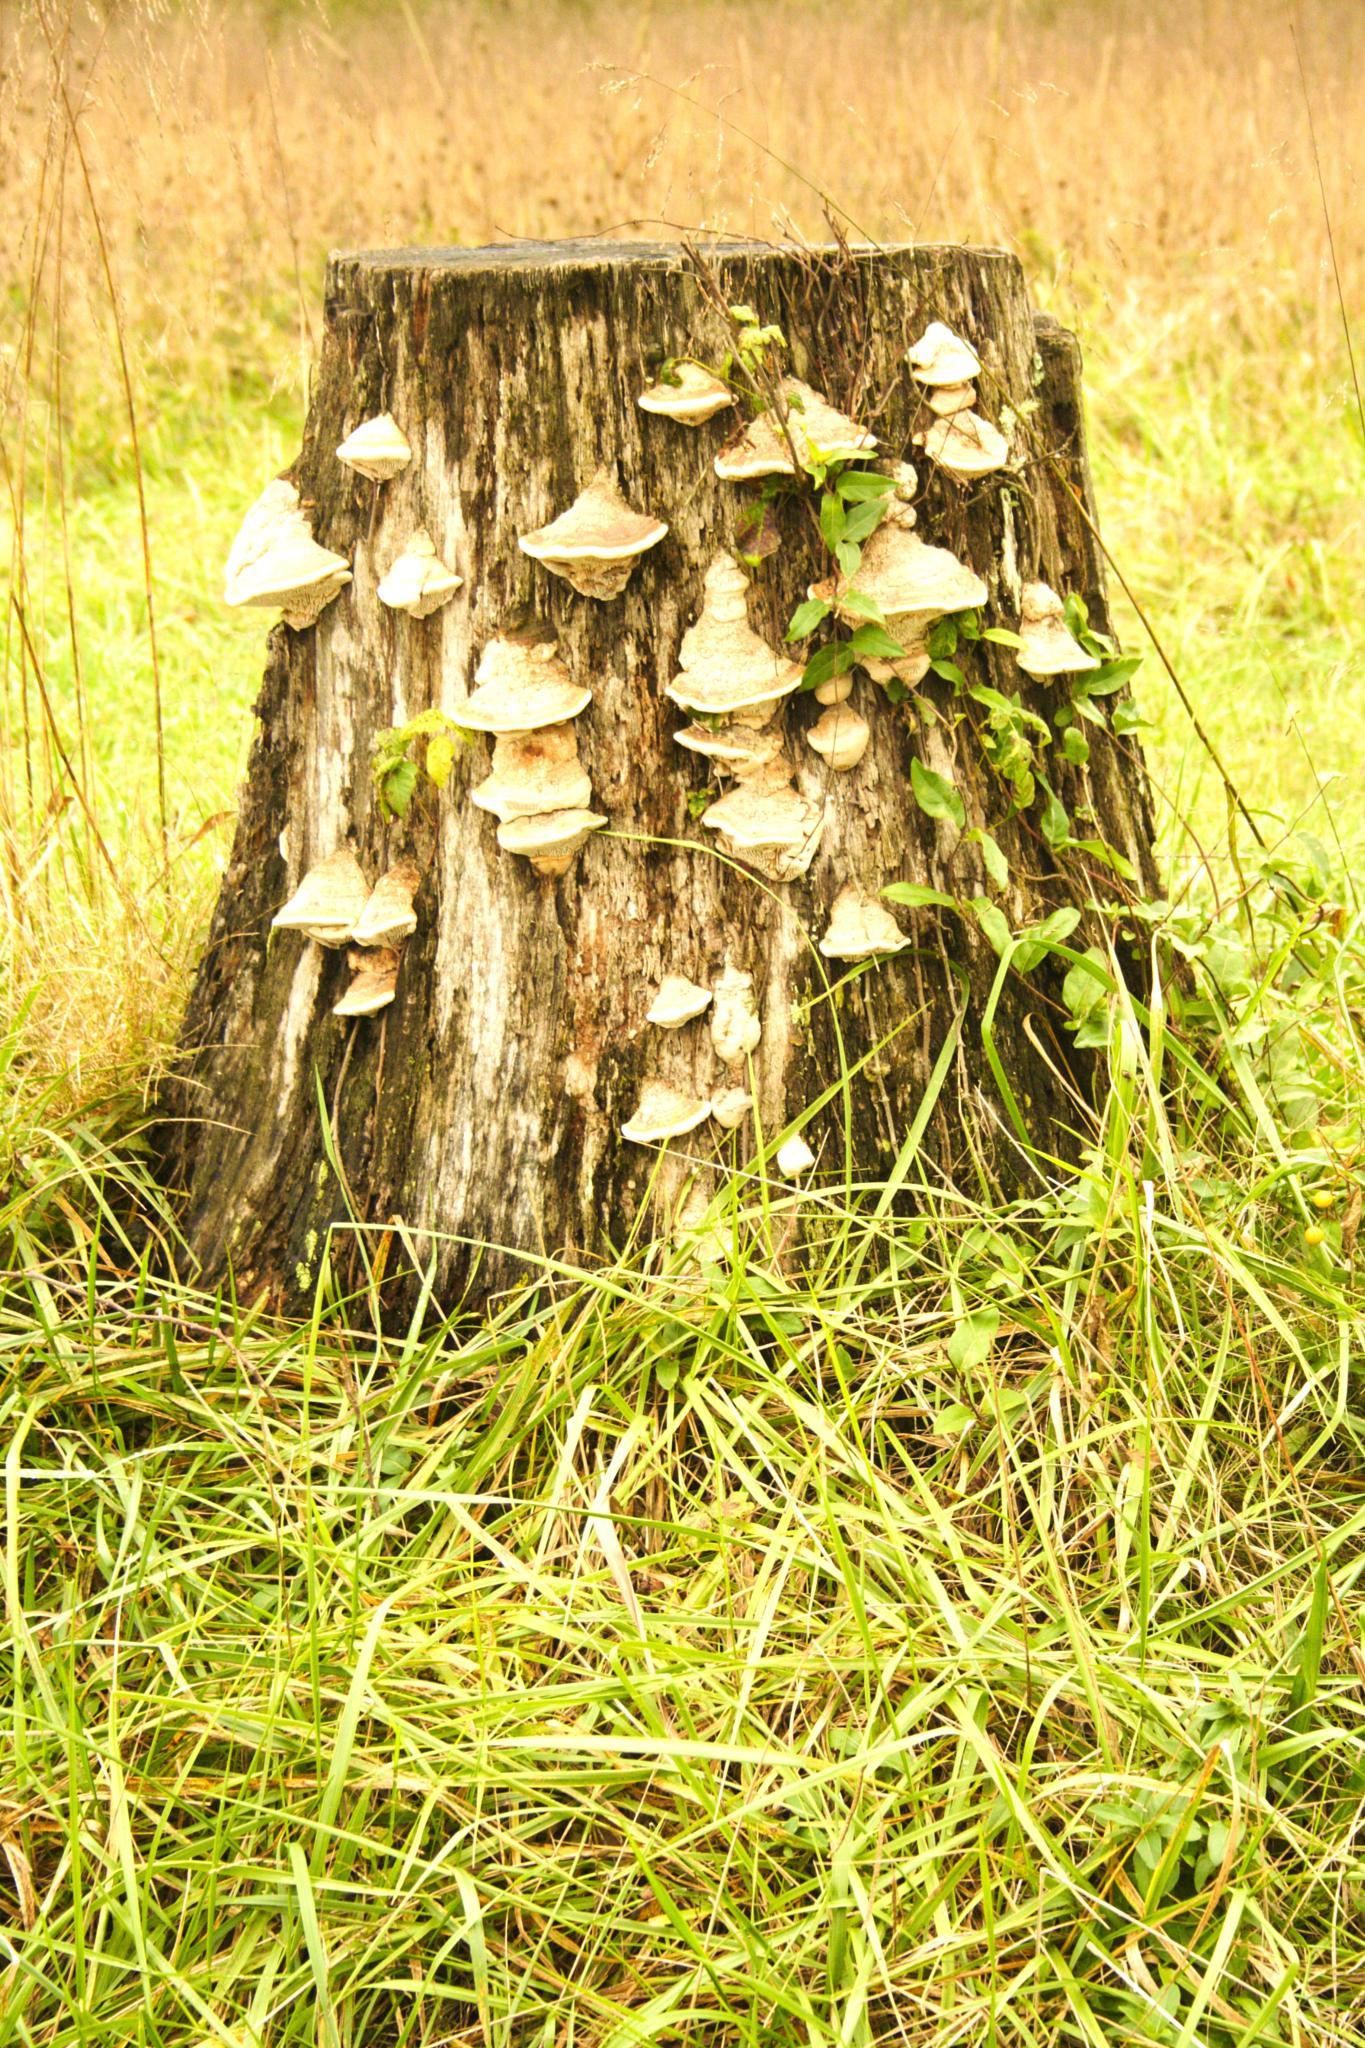 Tree Stump by christy